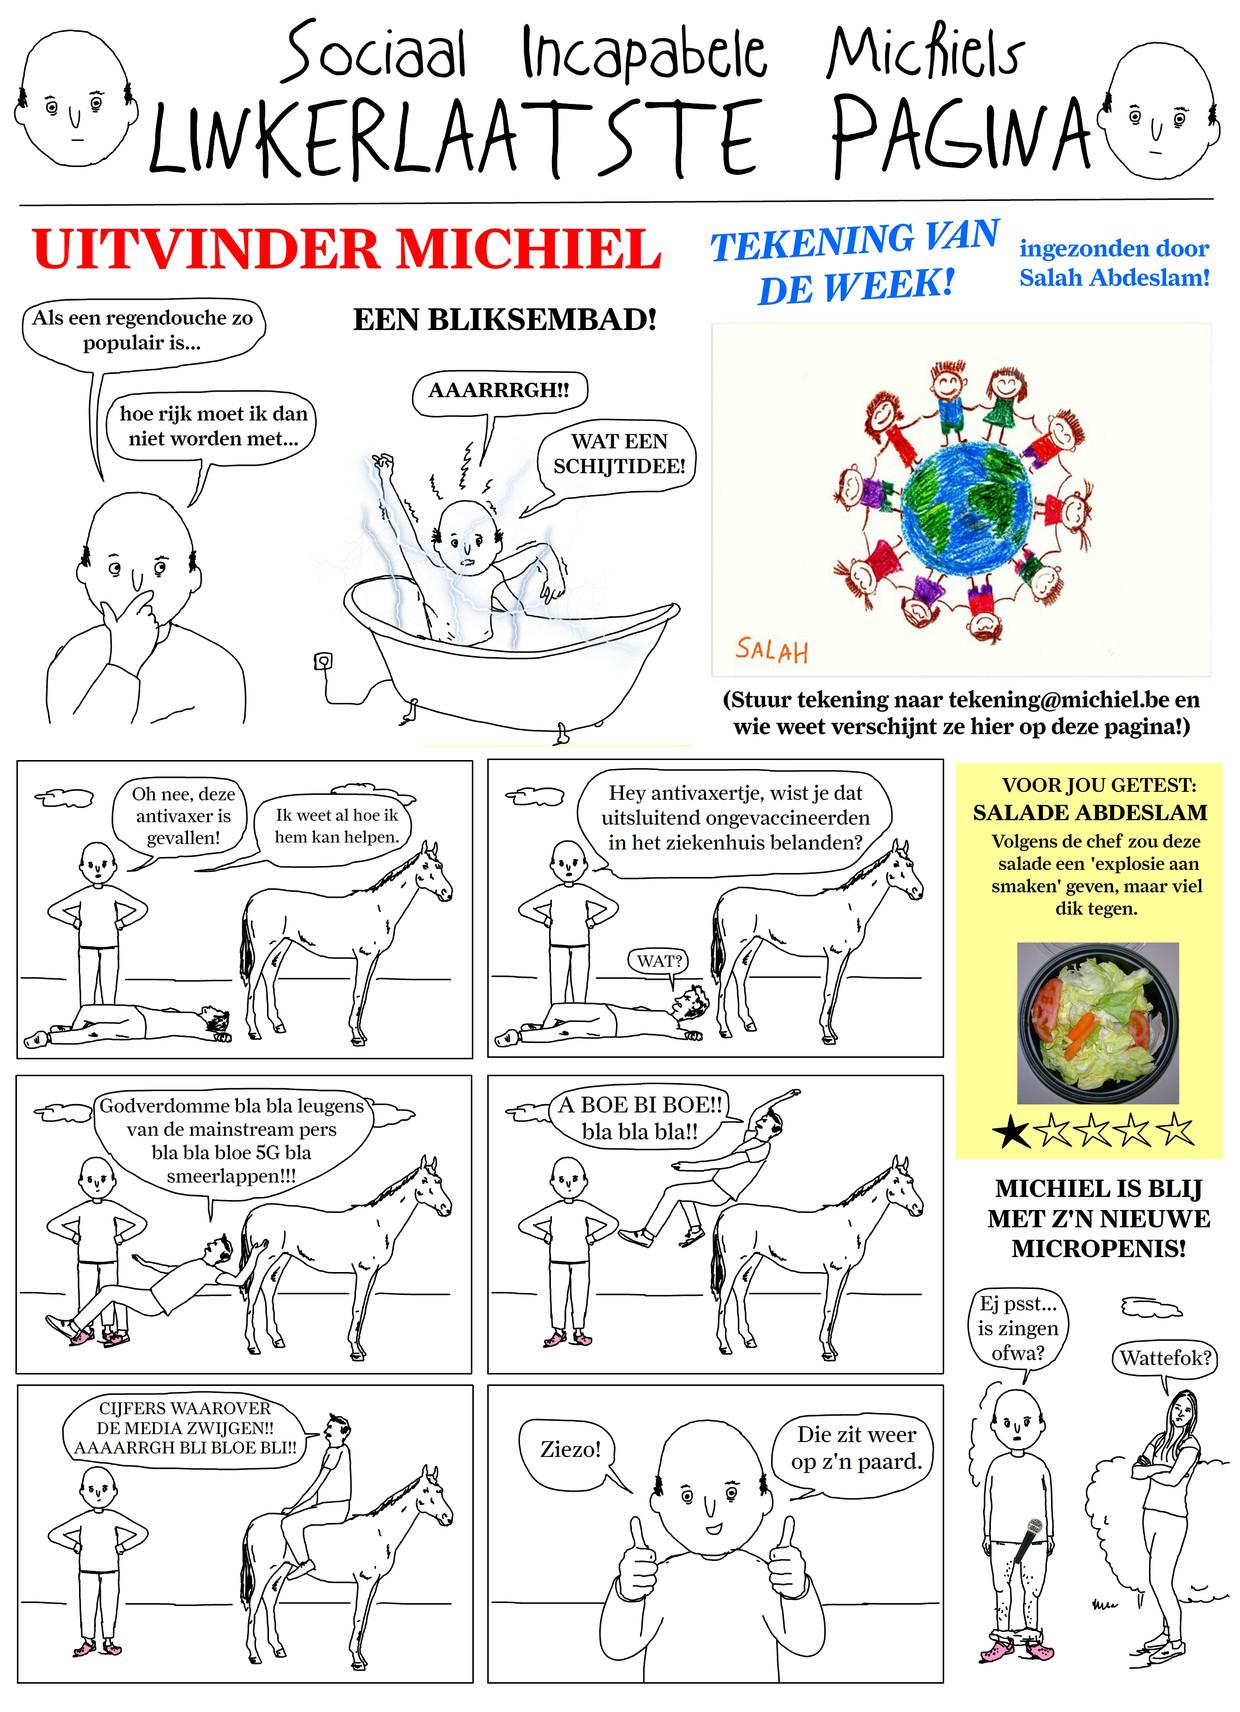 Sociaal Incapabele Michiel 37 Beeld Tom Borremans | Humo